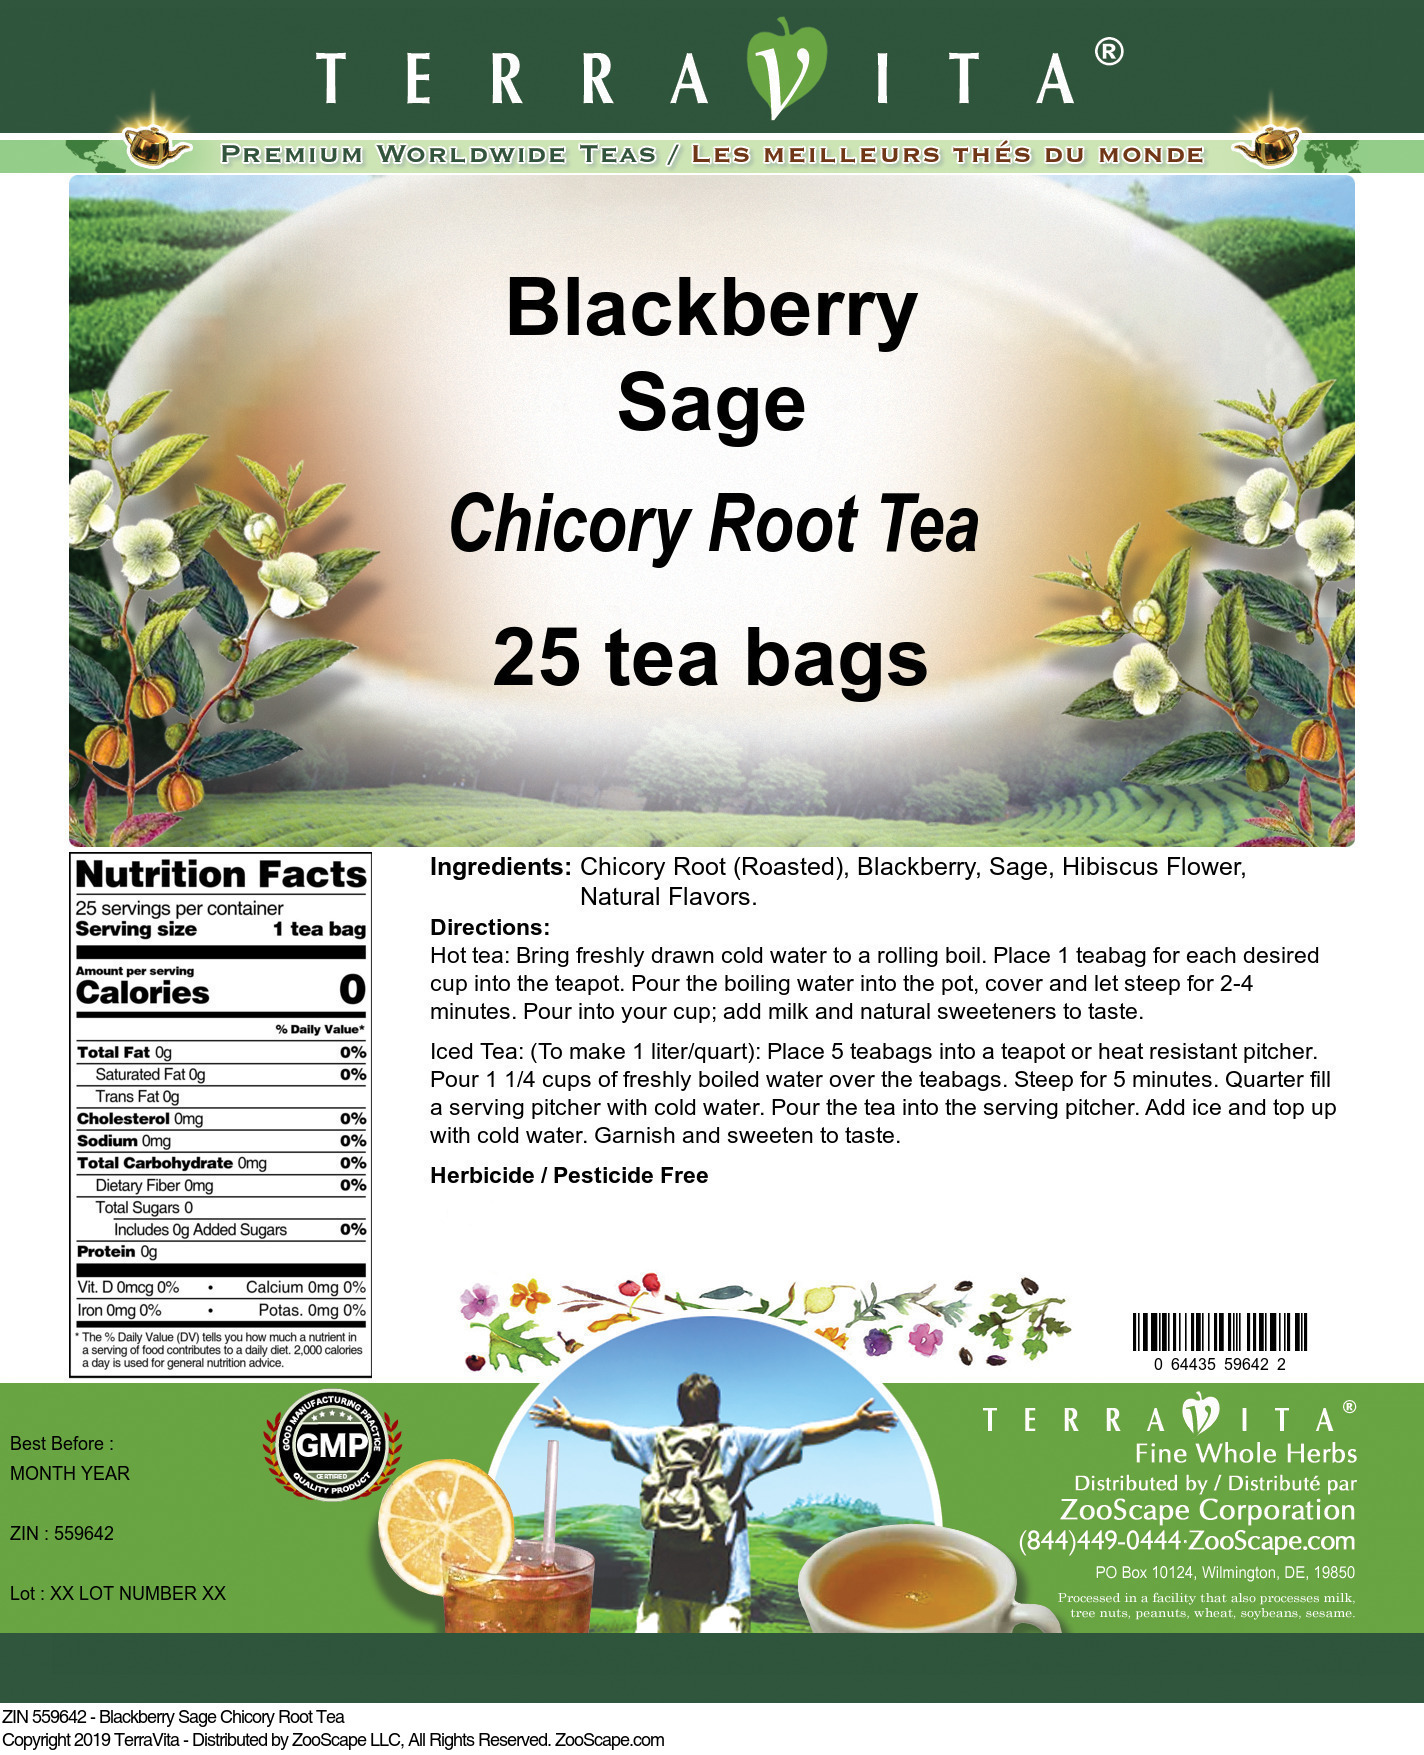 Blackberry Sage Chicory Root Tea